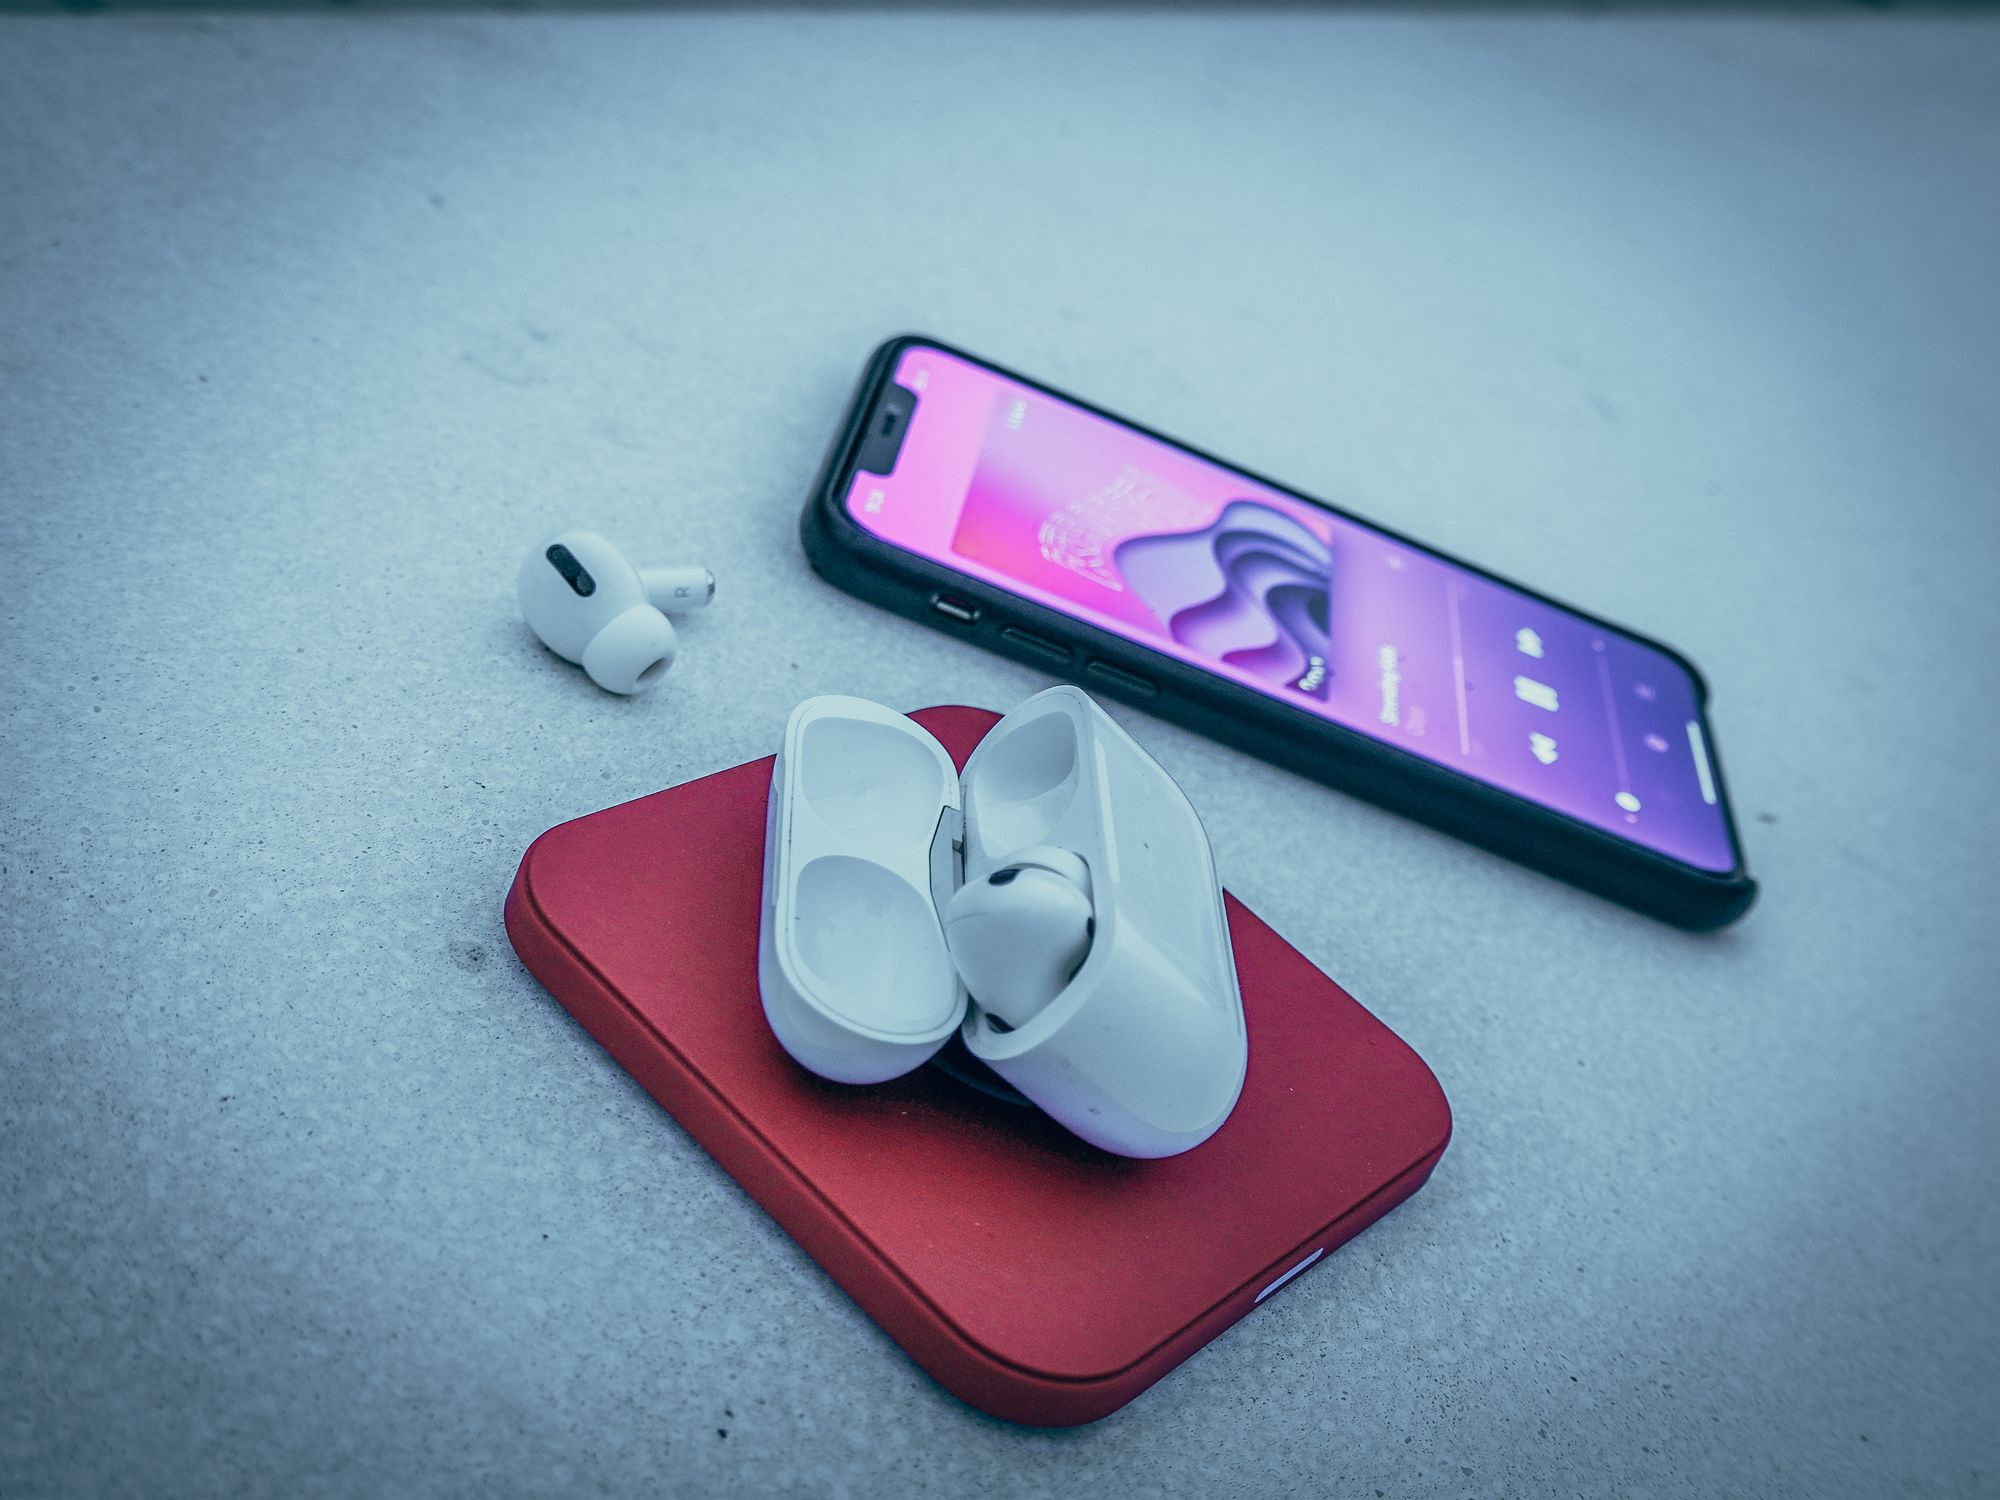 AirPods Pro e iPhone 11 Pro